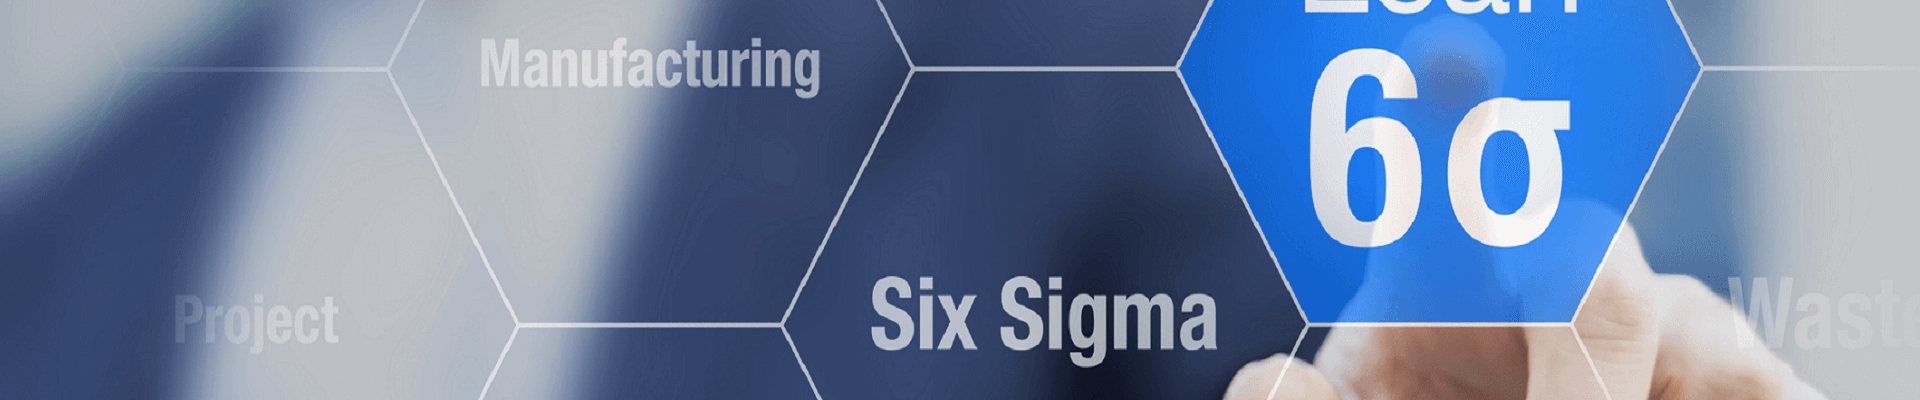 Lean Six Sigma Principles Training